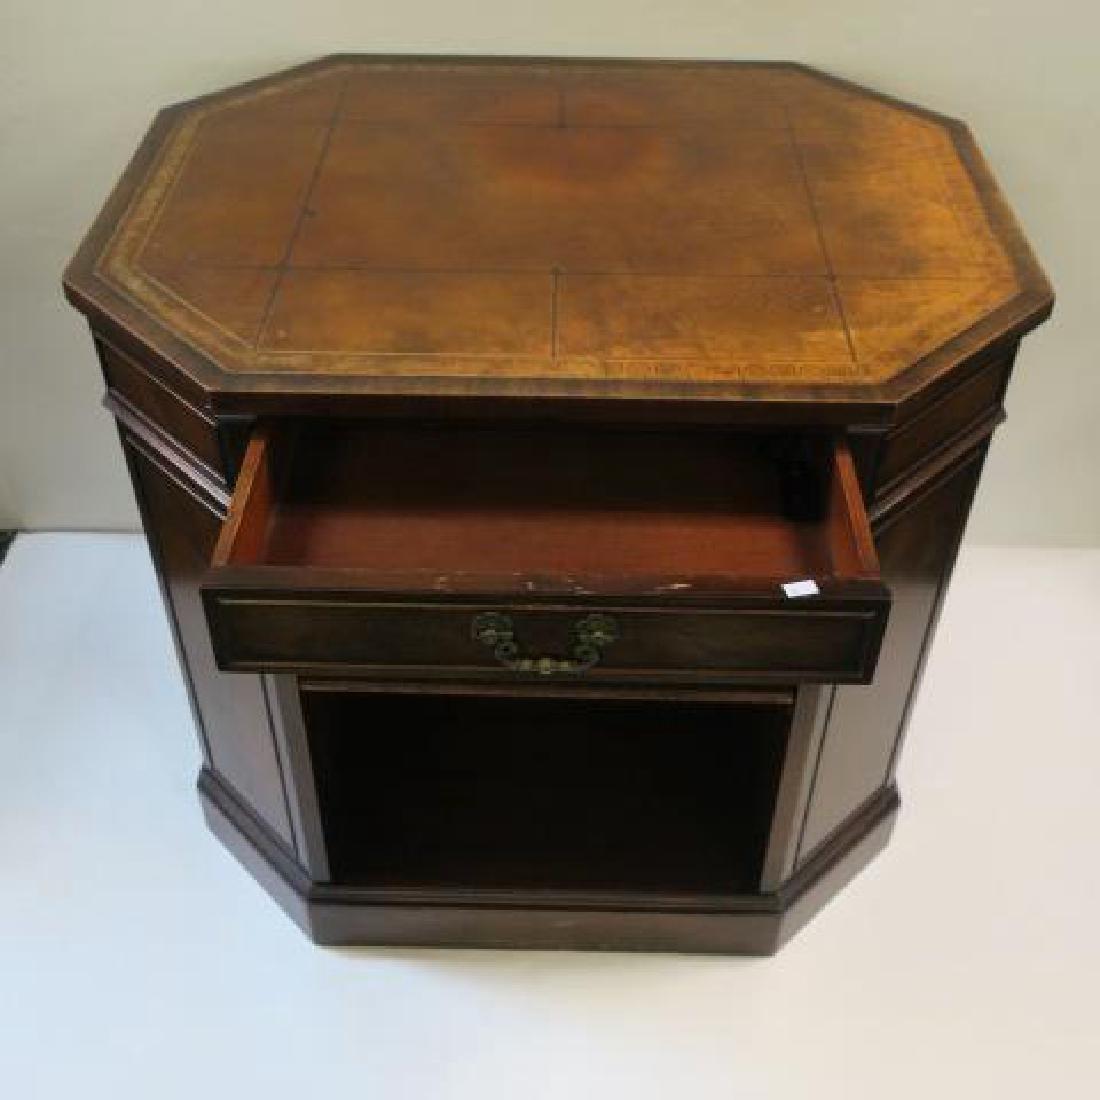 Leather top Book Shelf Octagonal Center Desk: - 2